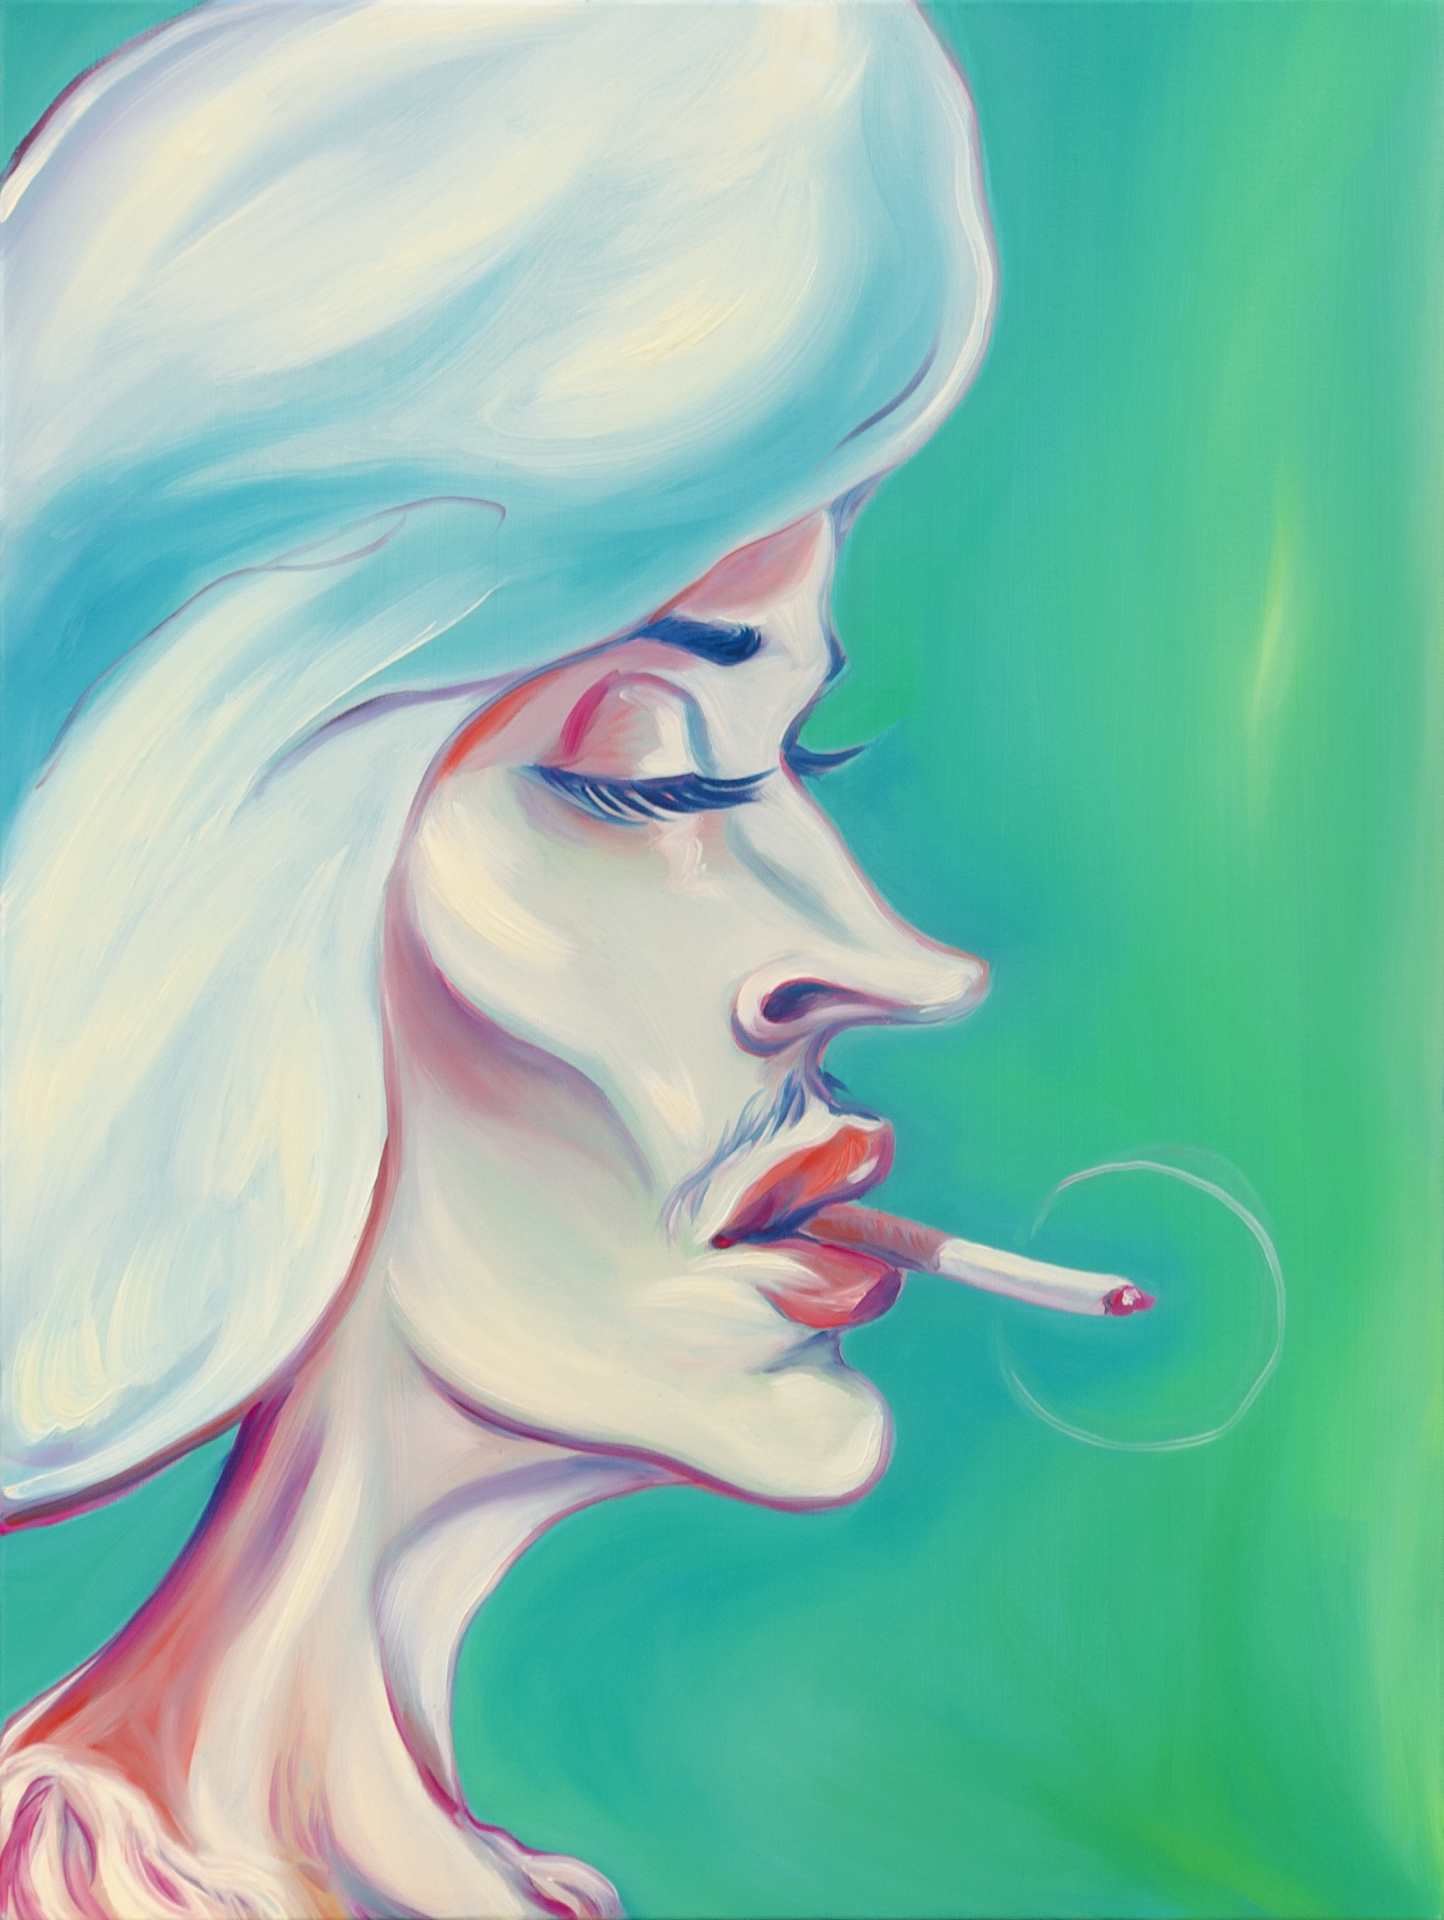 Luigi Presicce - Homo Sapiens Sapiens Sapiens (Signora fumante) - 2020 - Olio su tela - 80x60cm - fot_n_ 2393 - Cod_12Pre2020